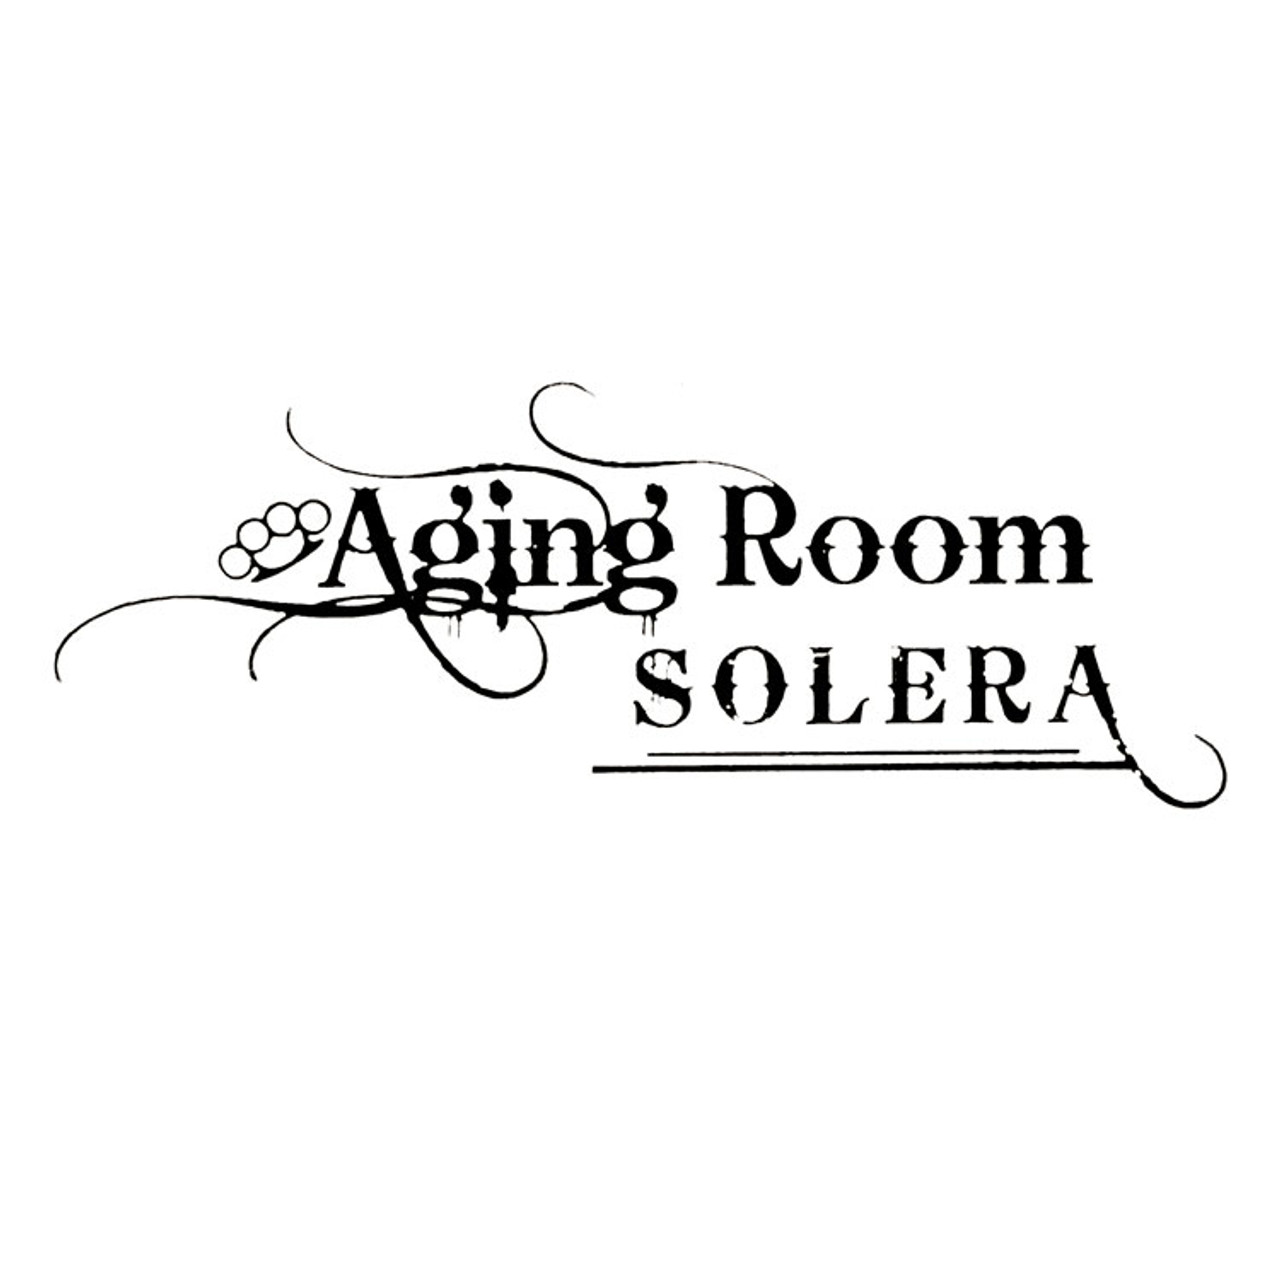 Aging Room Solera Festivo Maduro Cigars - 4.75 x 52 (Box of 21)